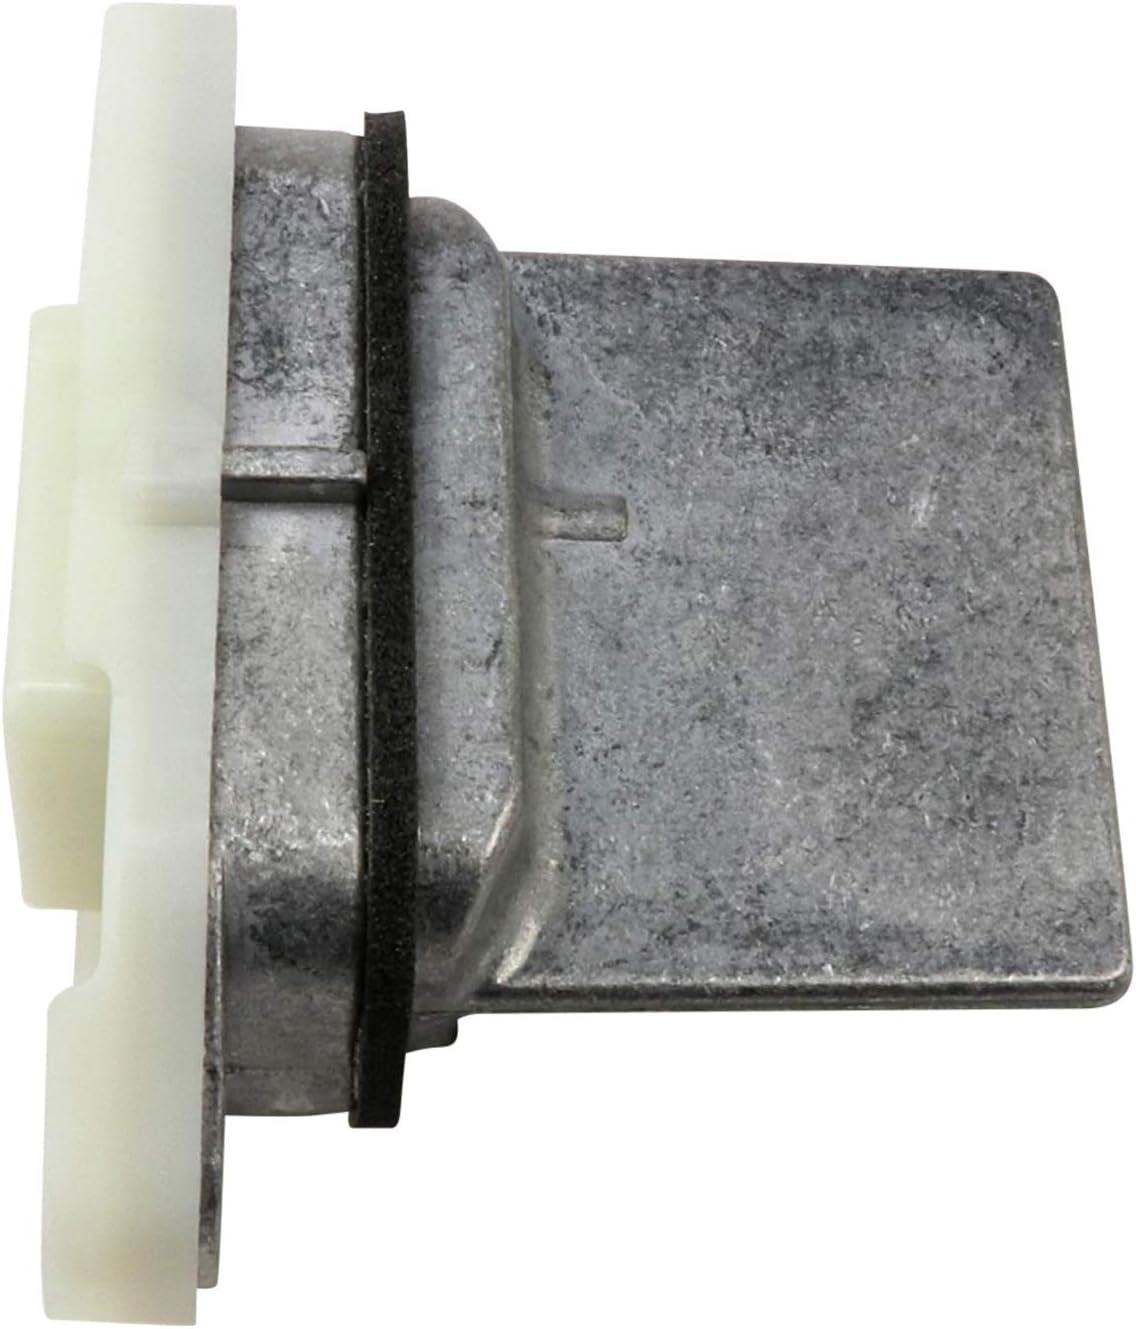 BECKARNLEY 204-0086 Blower Motor Resistor